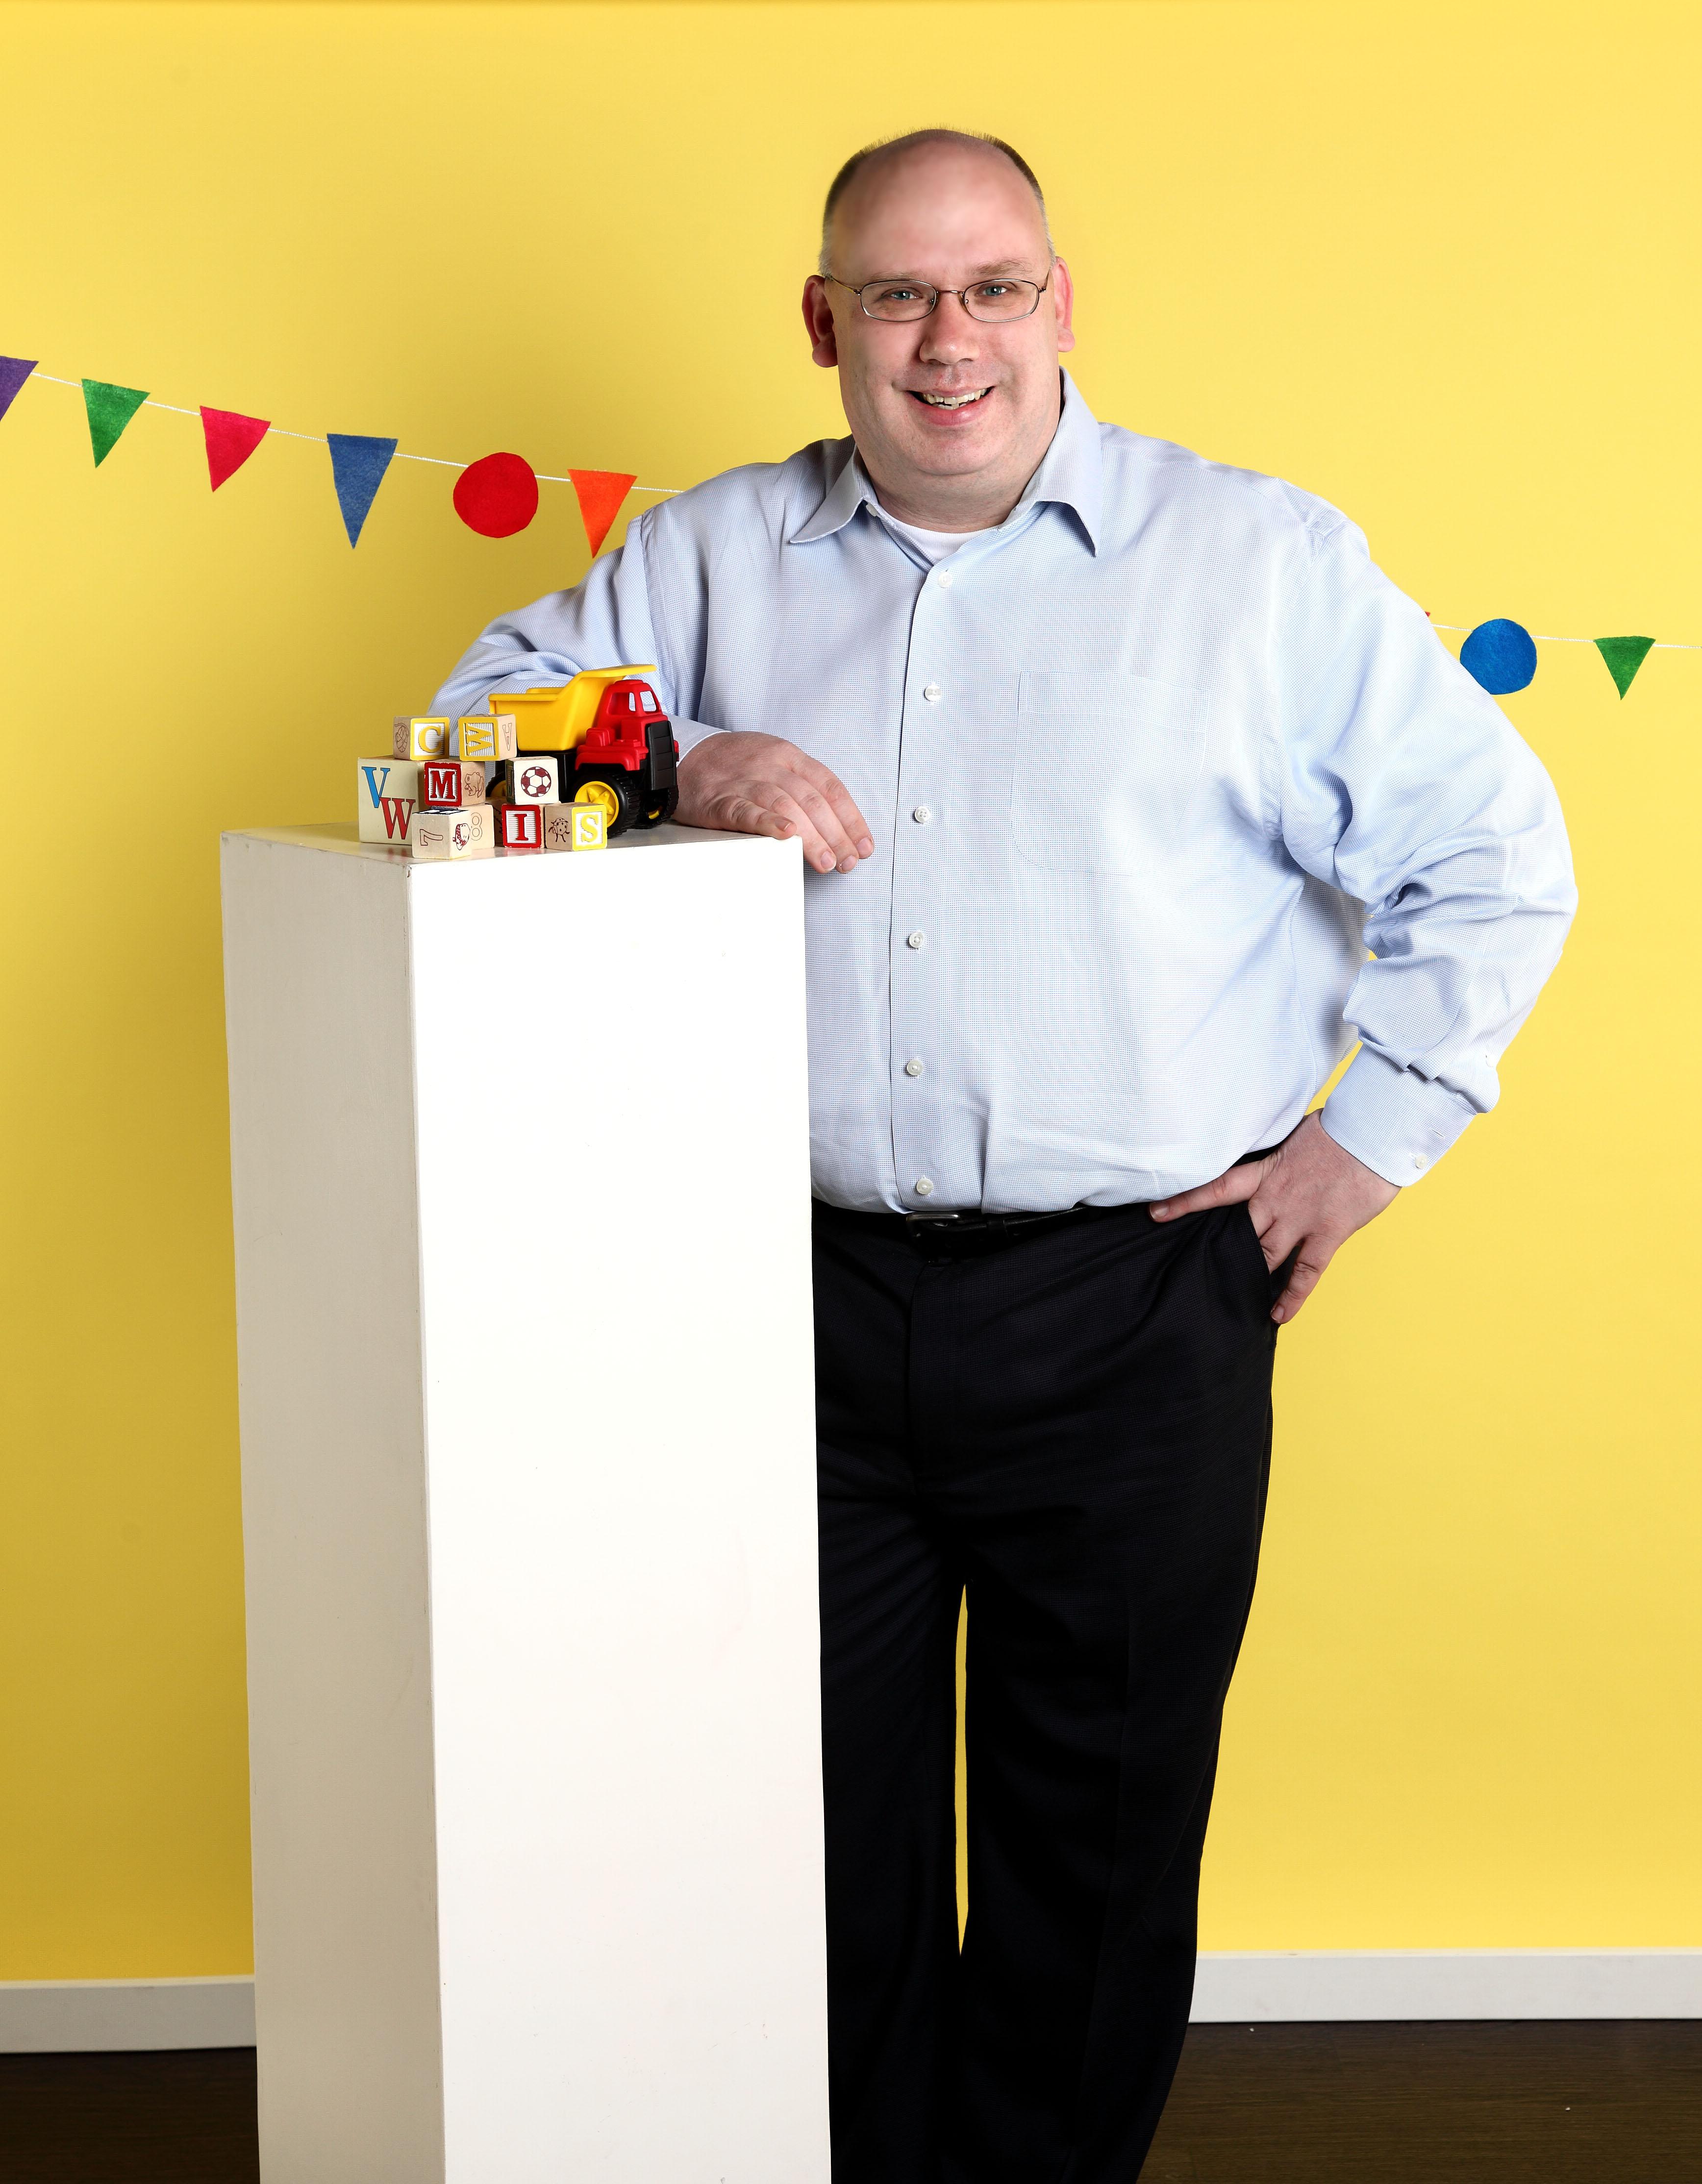 Zulily CEO Darrell Cavens